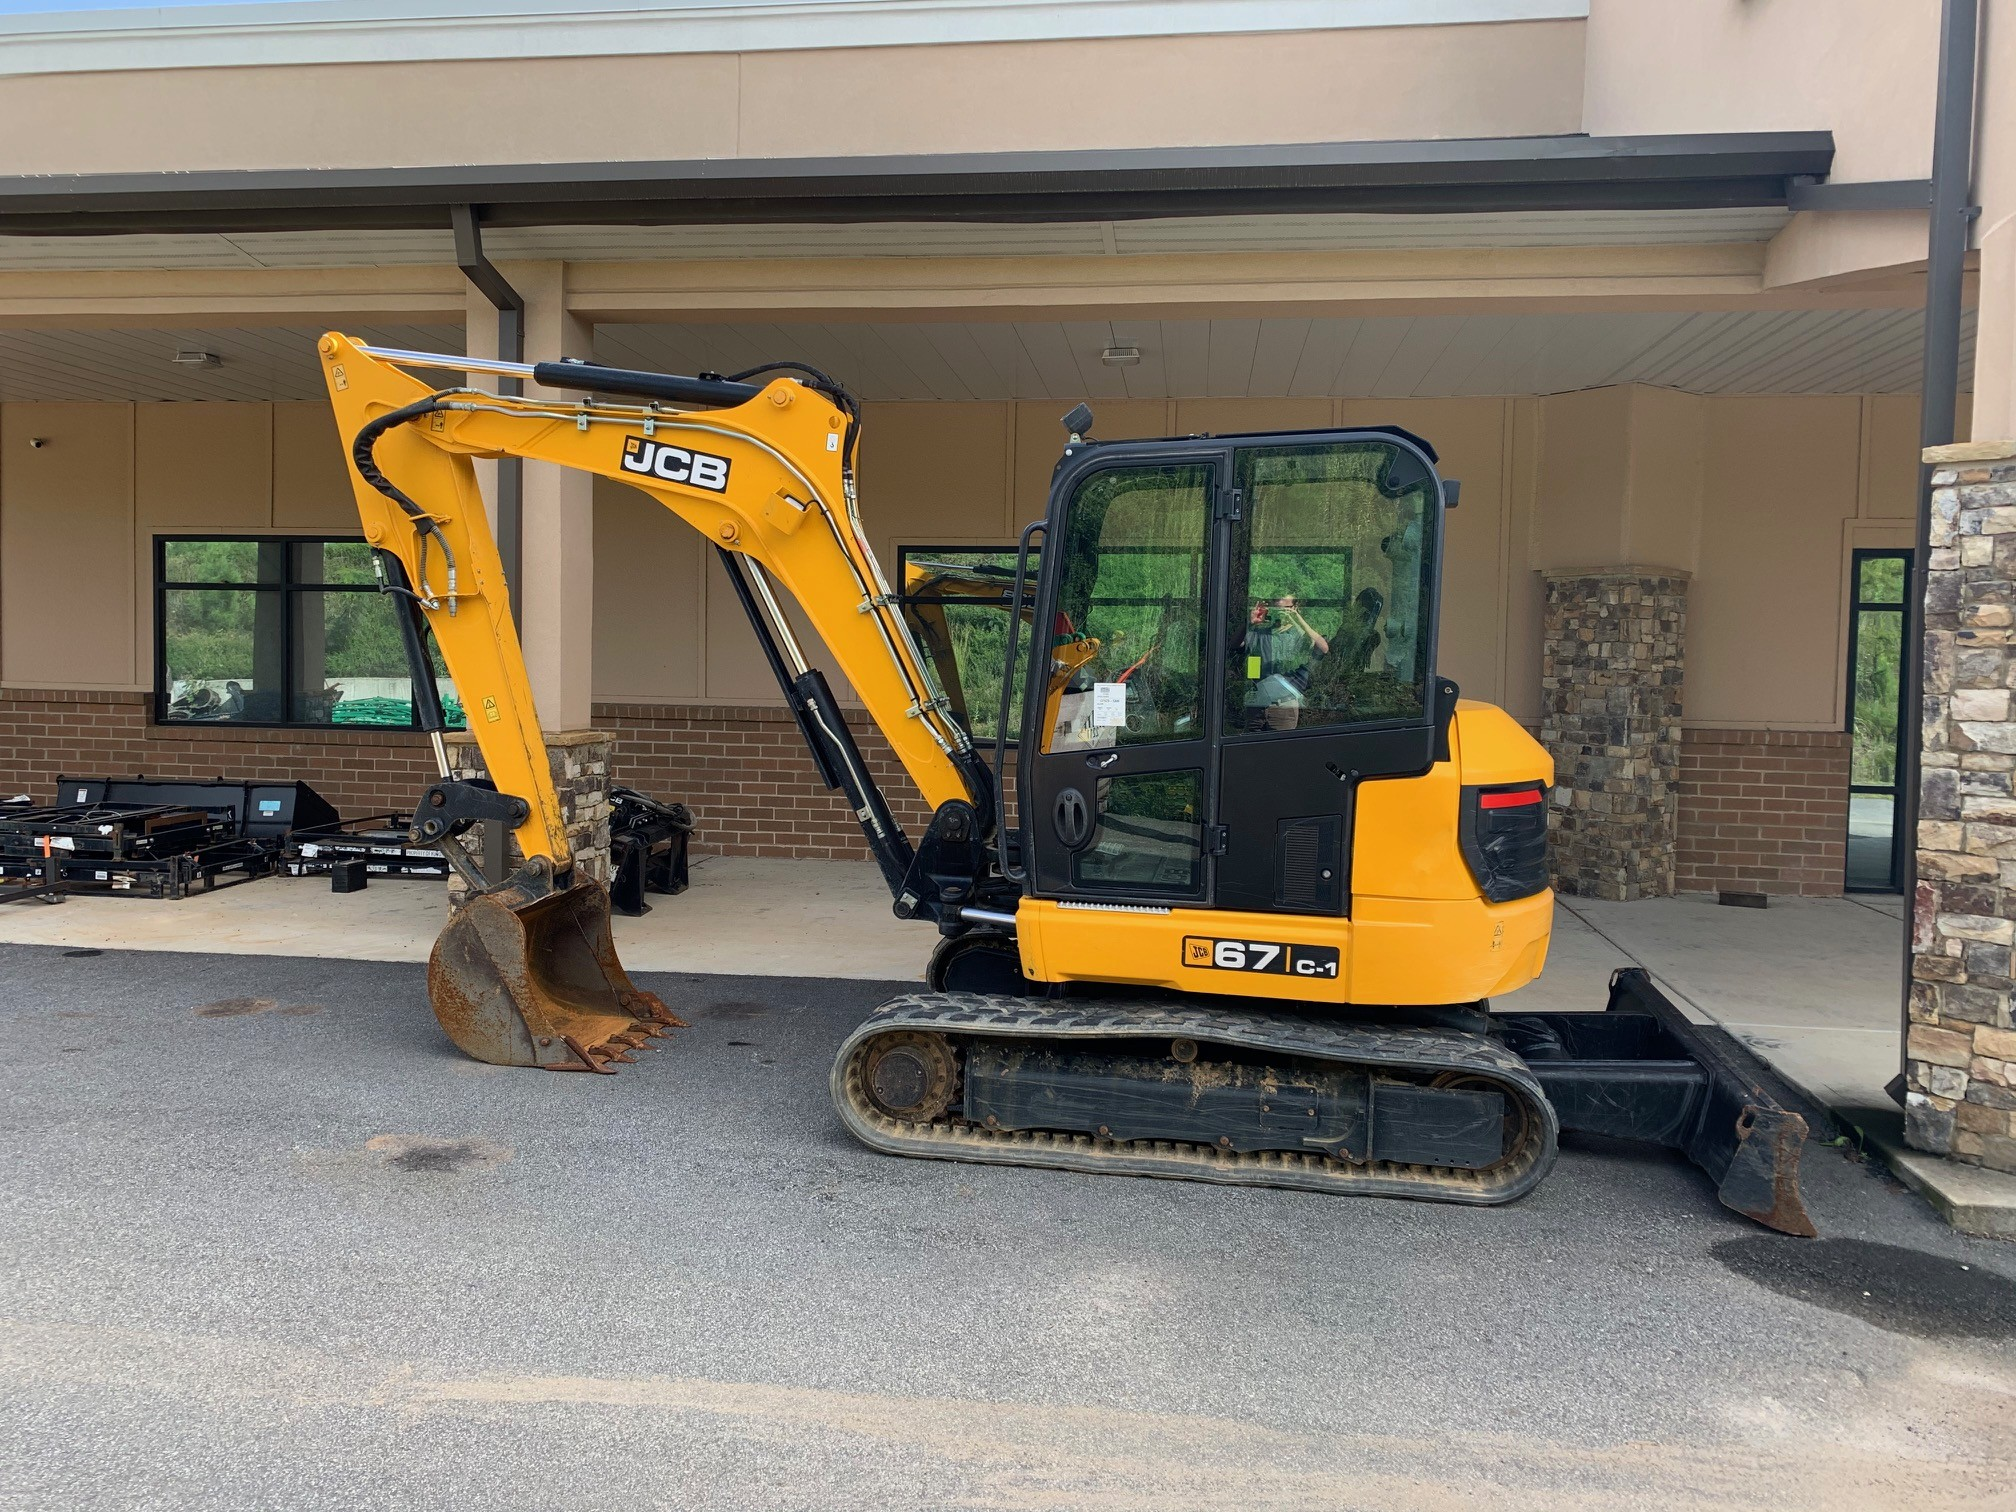 Used, 2015, JCB, 67C - 1, Excavators